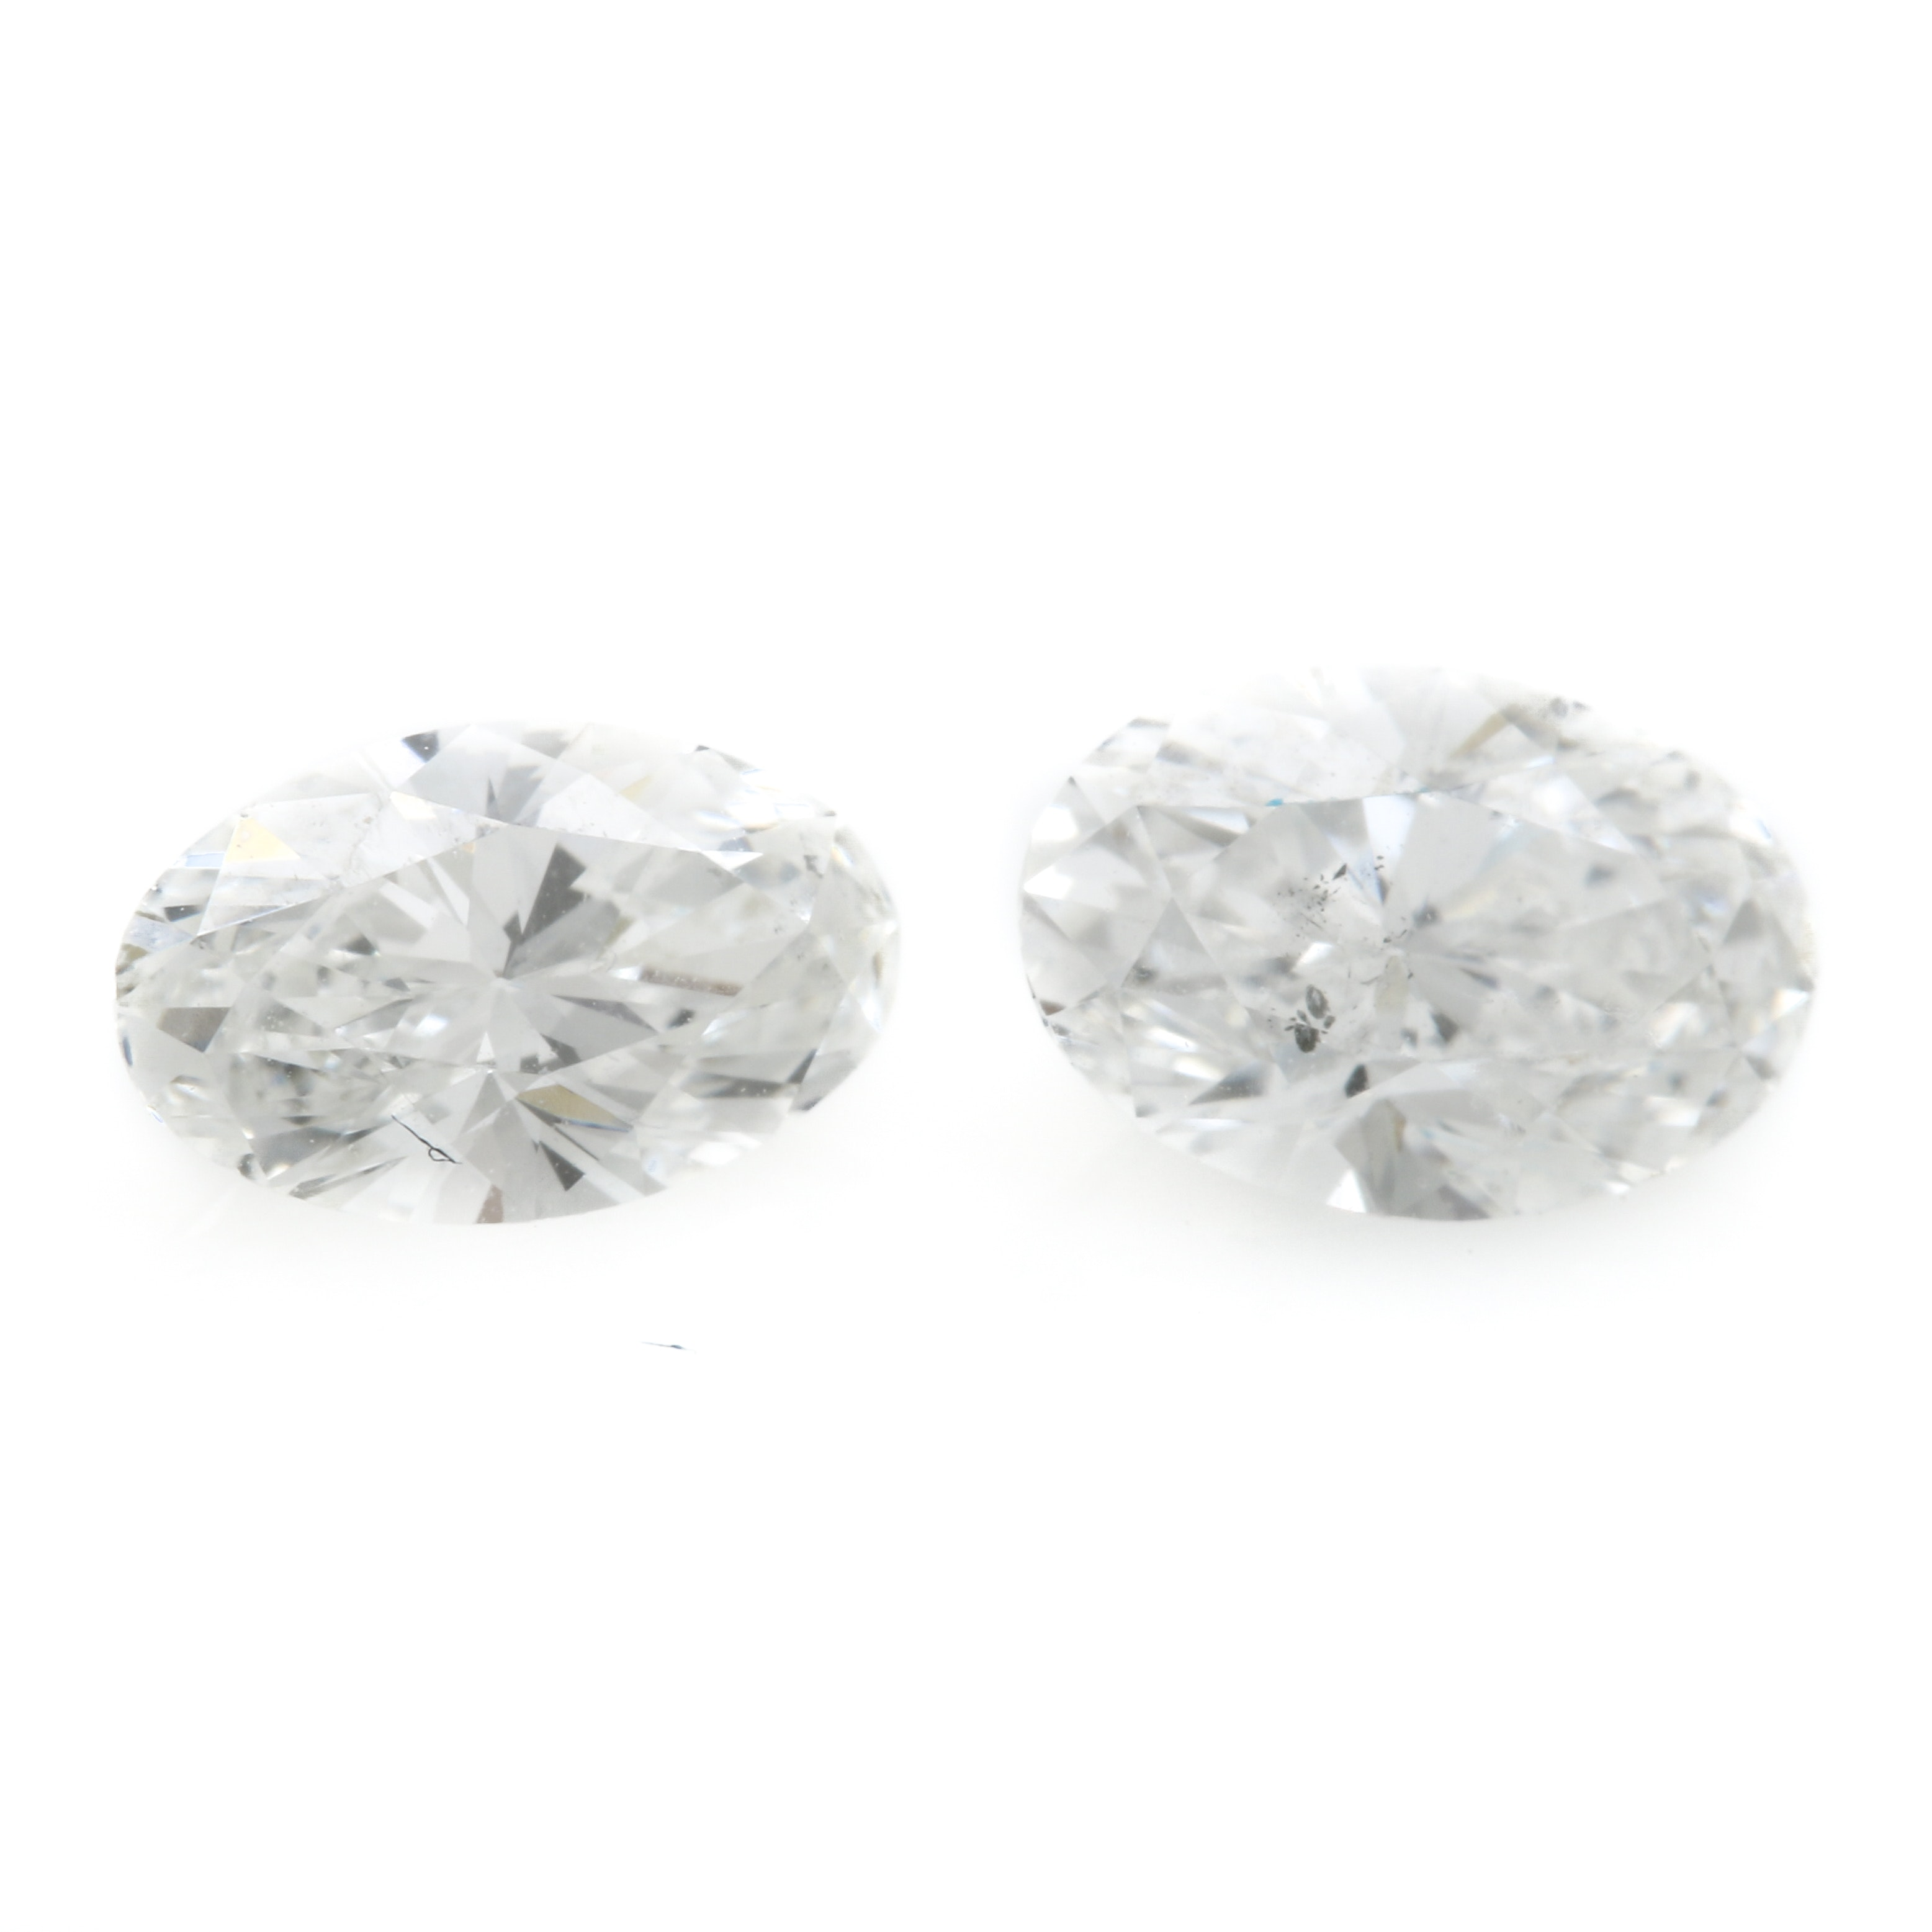 Oval Brilliant Faceted Loose Diamonds